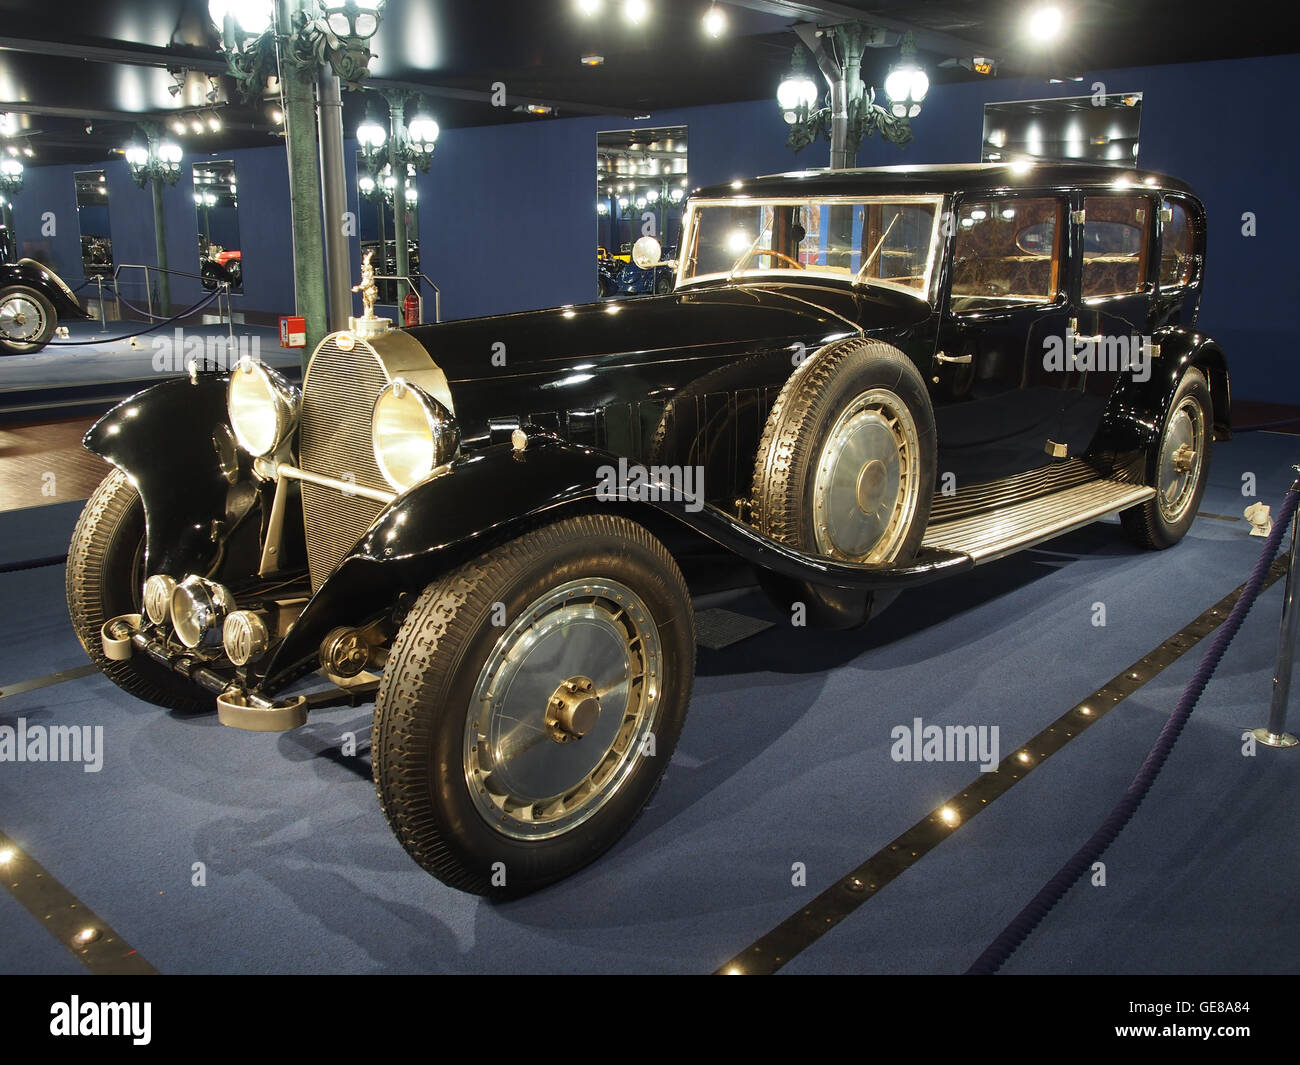 1933 Bugatti Limousine TType 41 Royale, 300cv 12763cc 180kmh (MNA 0913) photo 1 - Stock Image